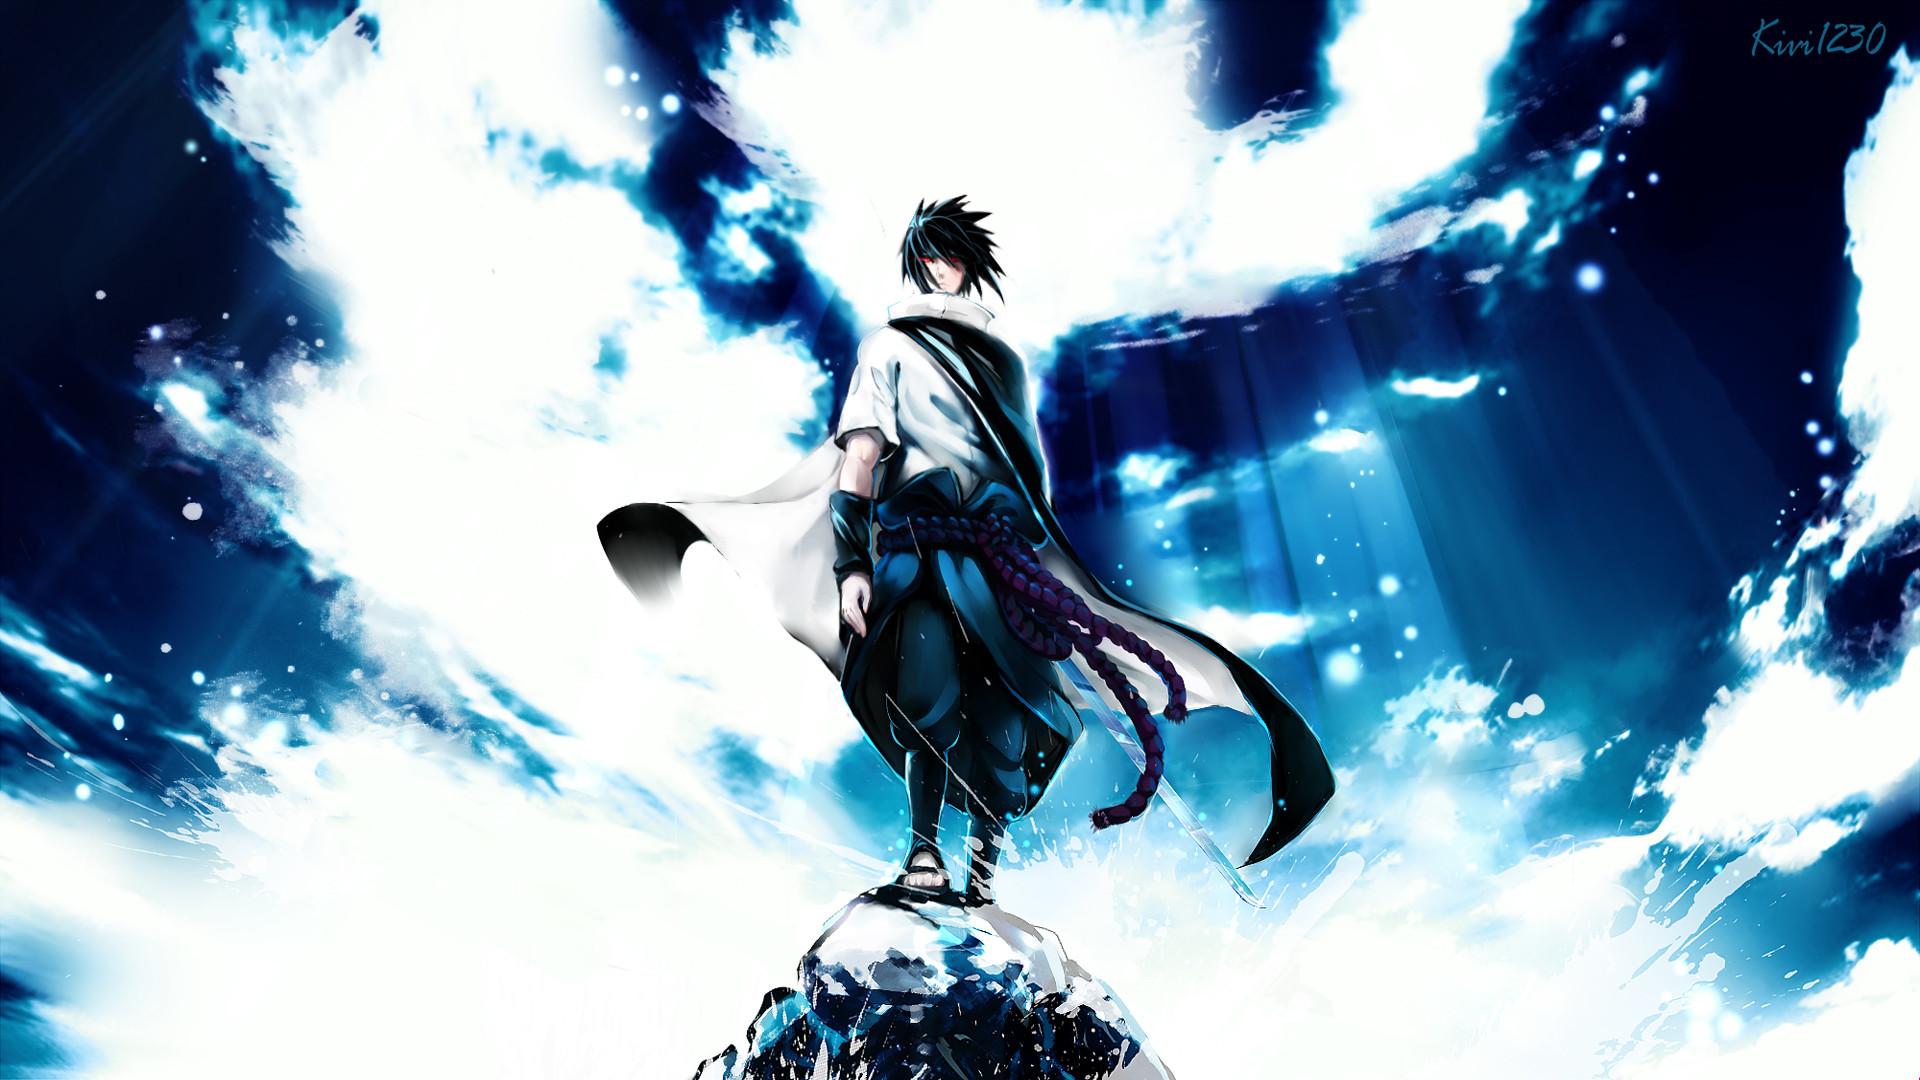 Fantasy Sword Warrior HD desktop wallpaper : High Definition 1920×1080 Wallpaper  Anime Hd (